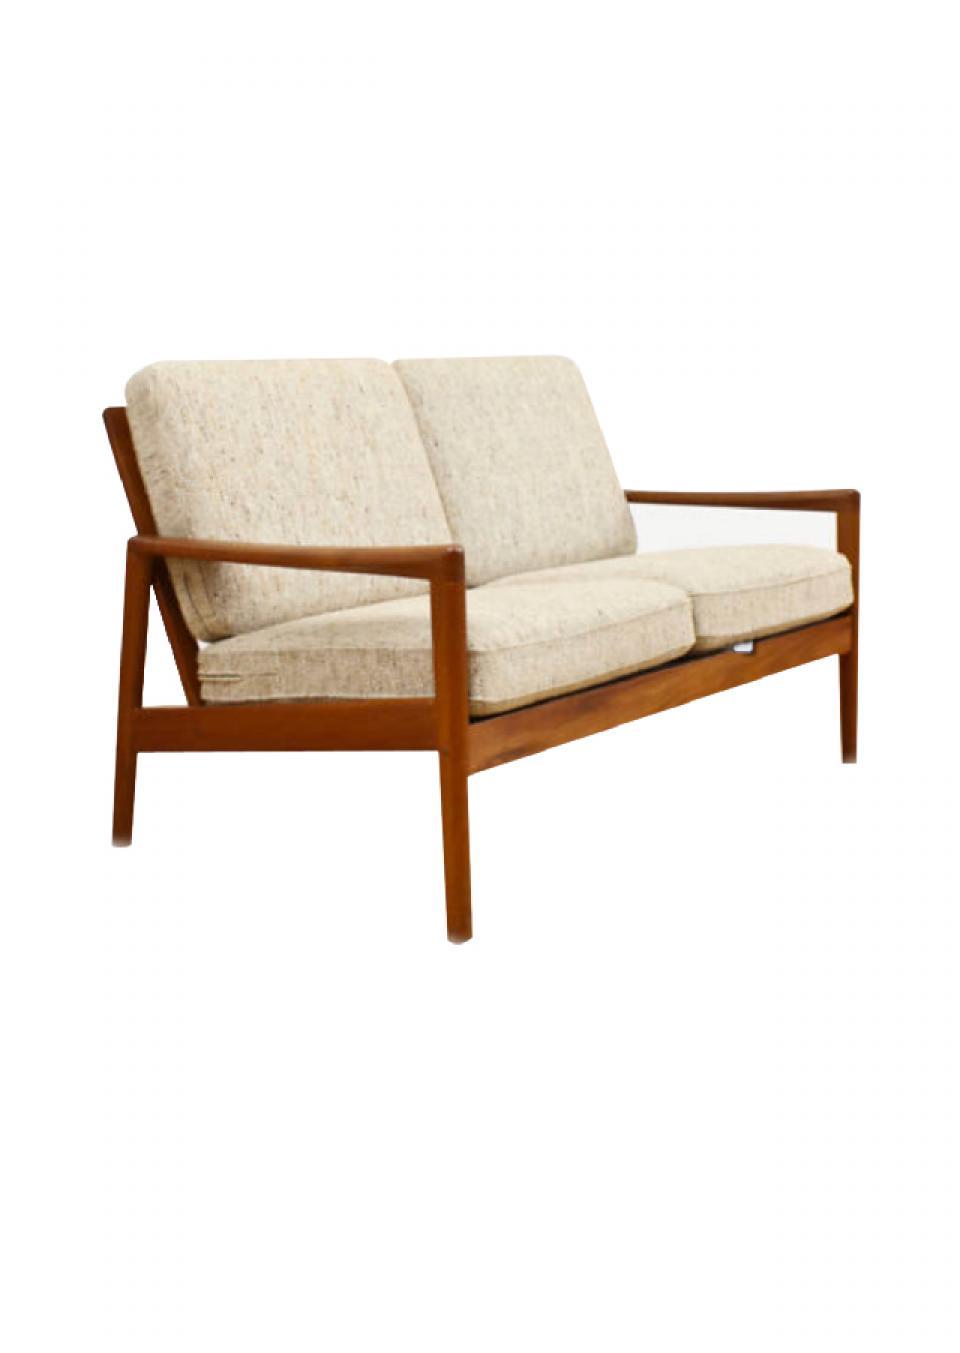 photos canap design scandinave. Black Bedroom Furniture Sets. Home Design Ideas